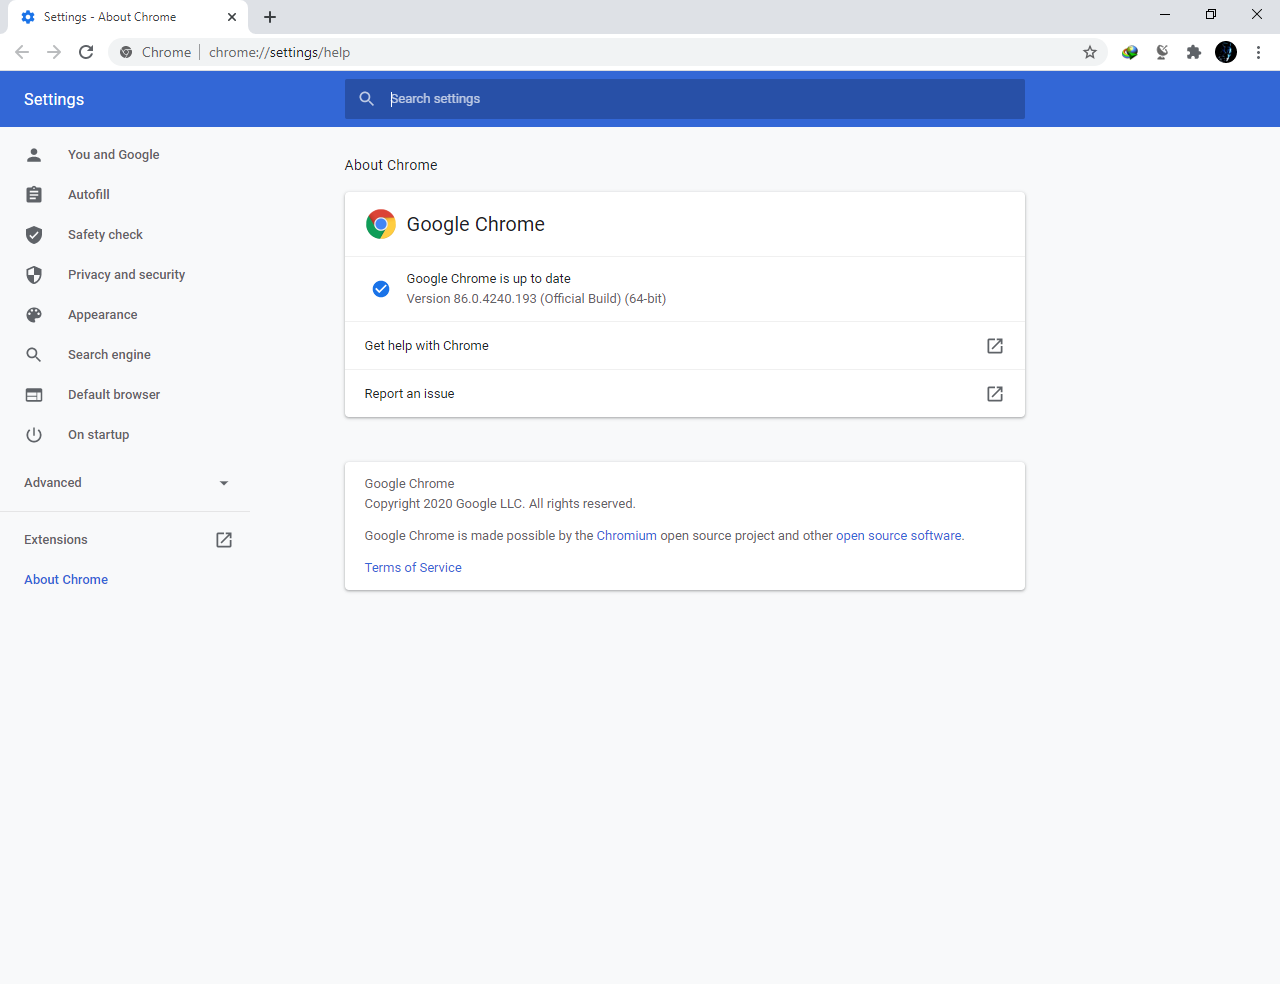 Google Chrome Browser 86.0.4240.193